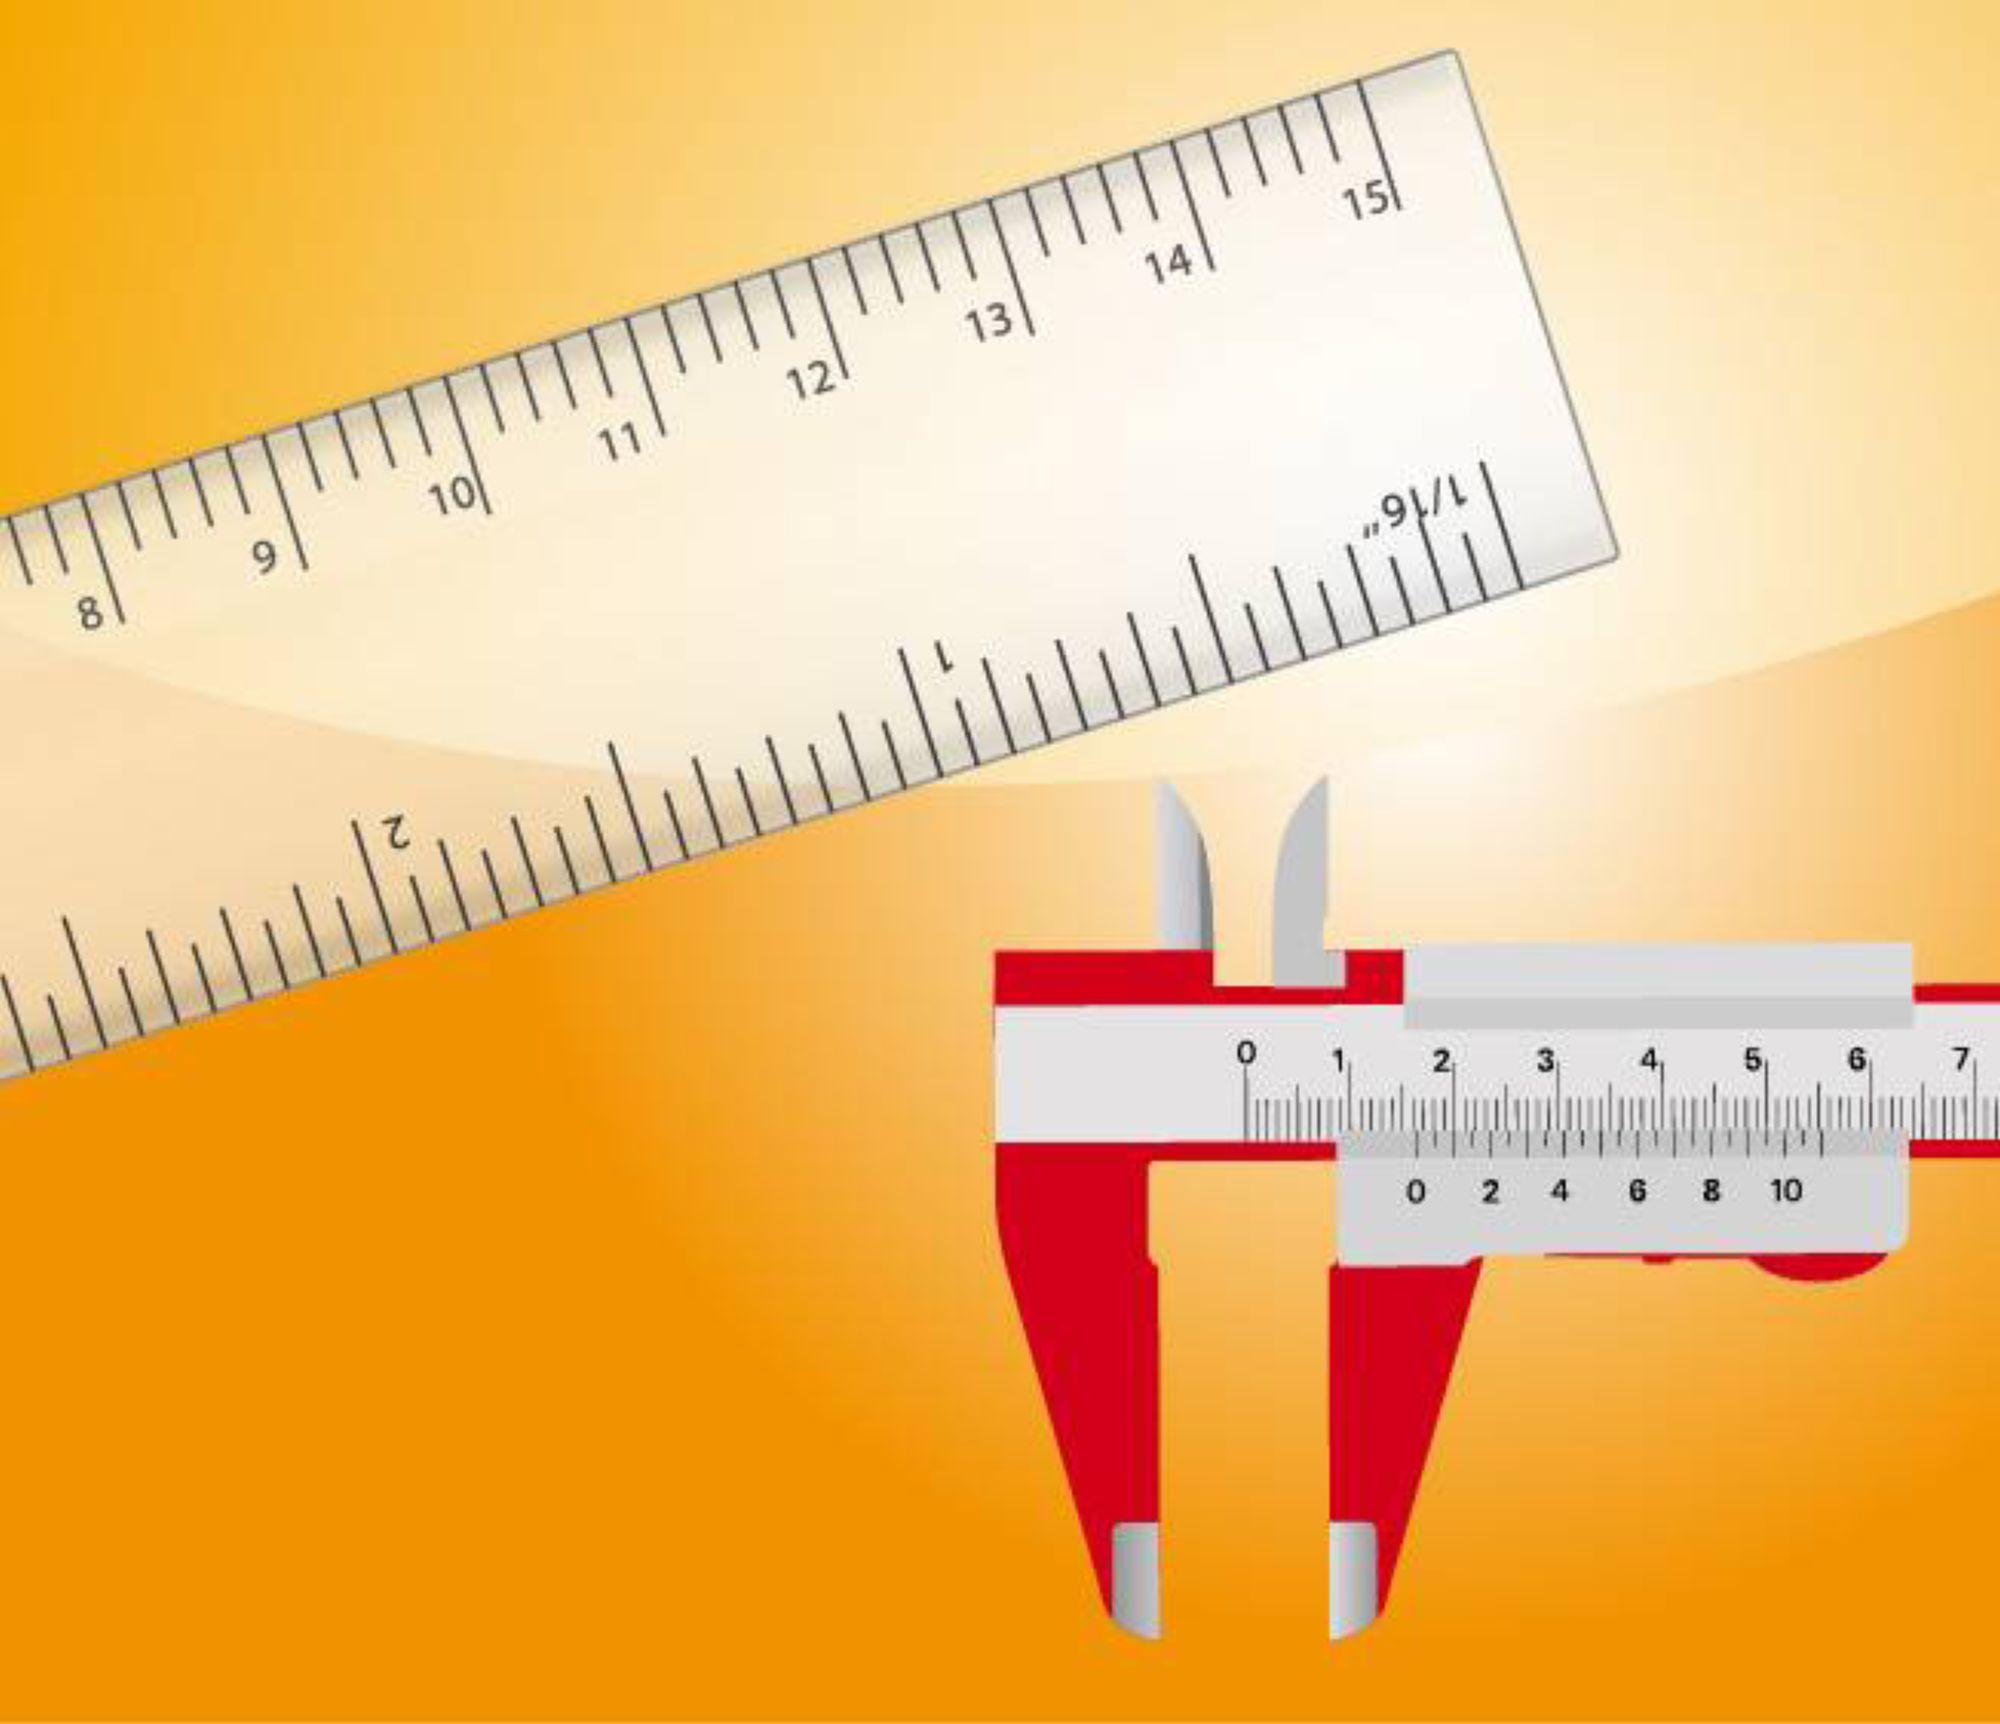 Délka a průměr trubice sondy